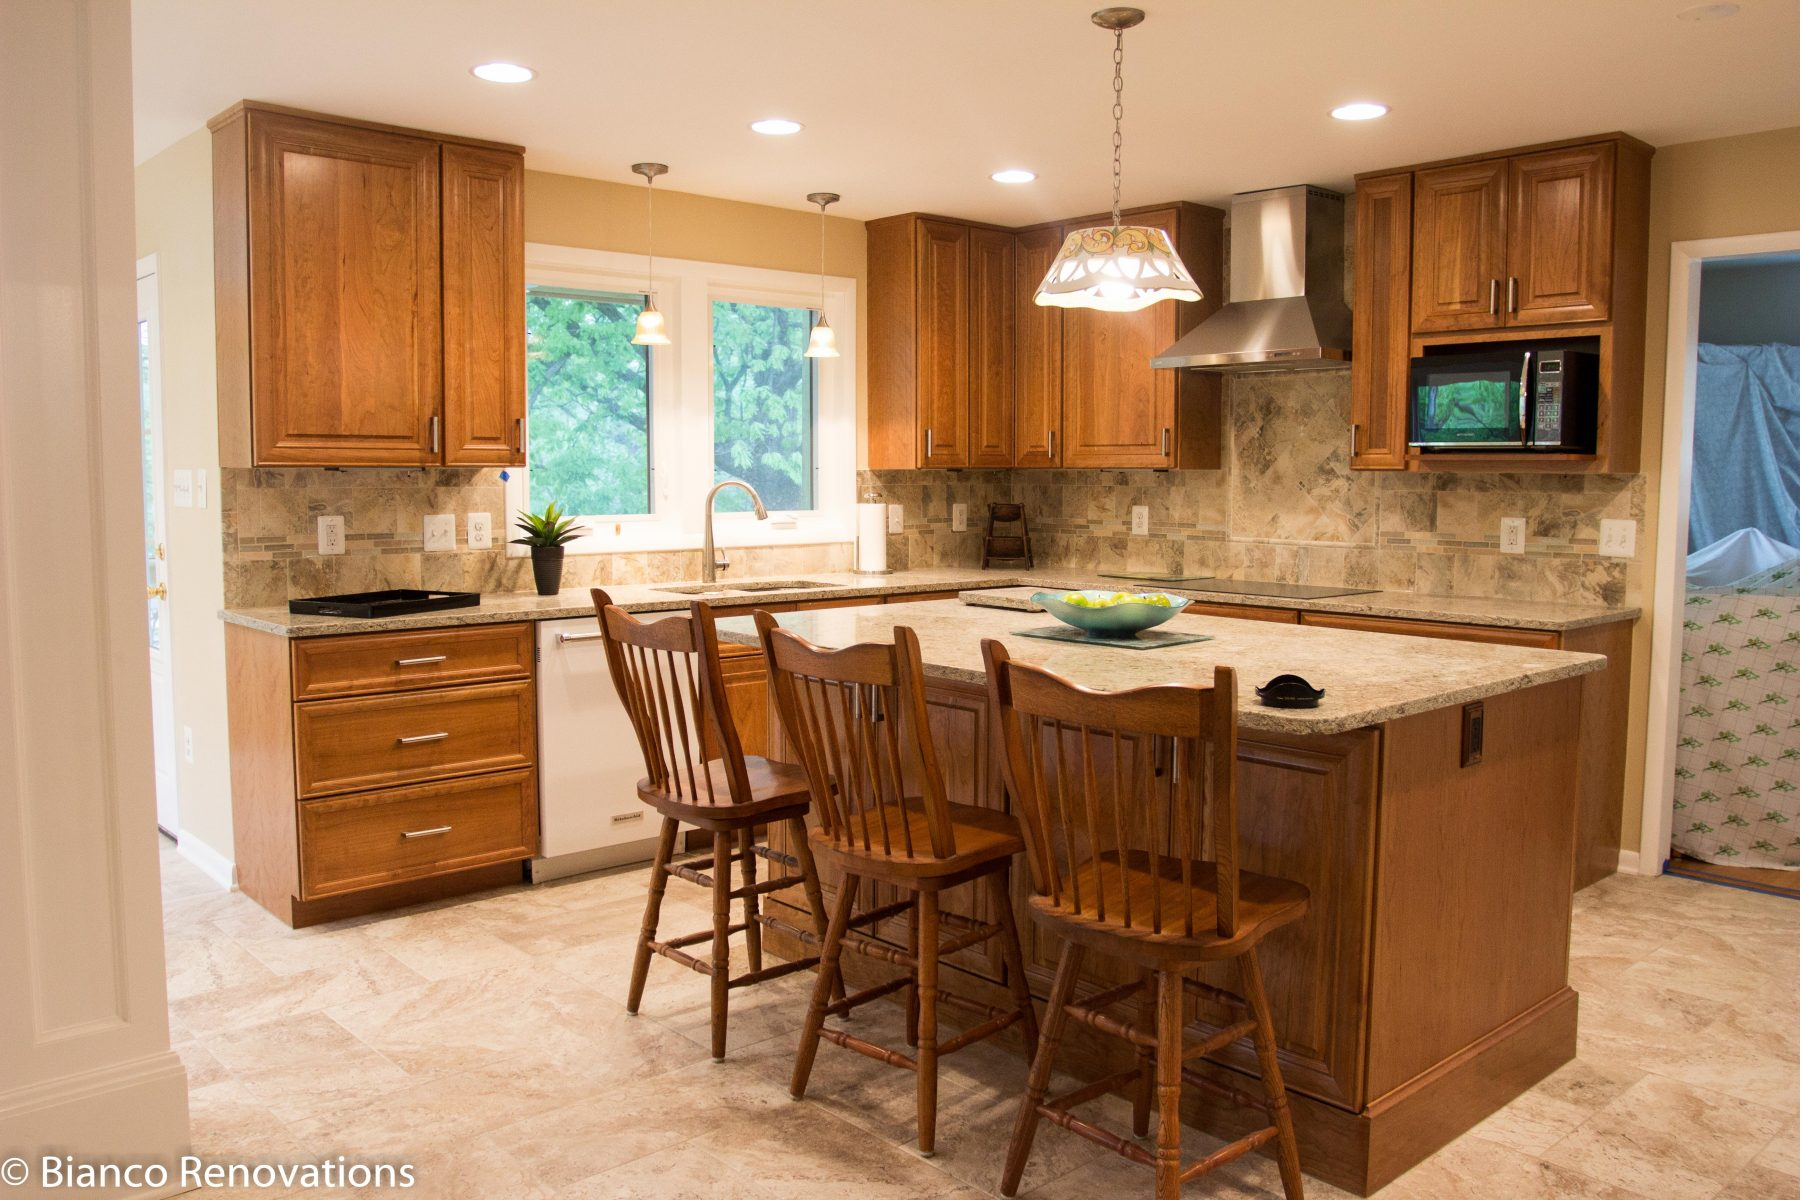 kitchen design alexandria va. we design beautiful livable kitchens